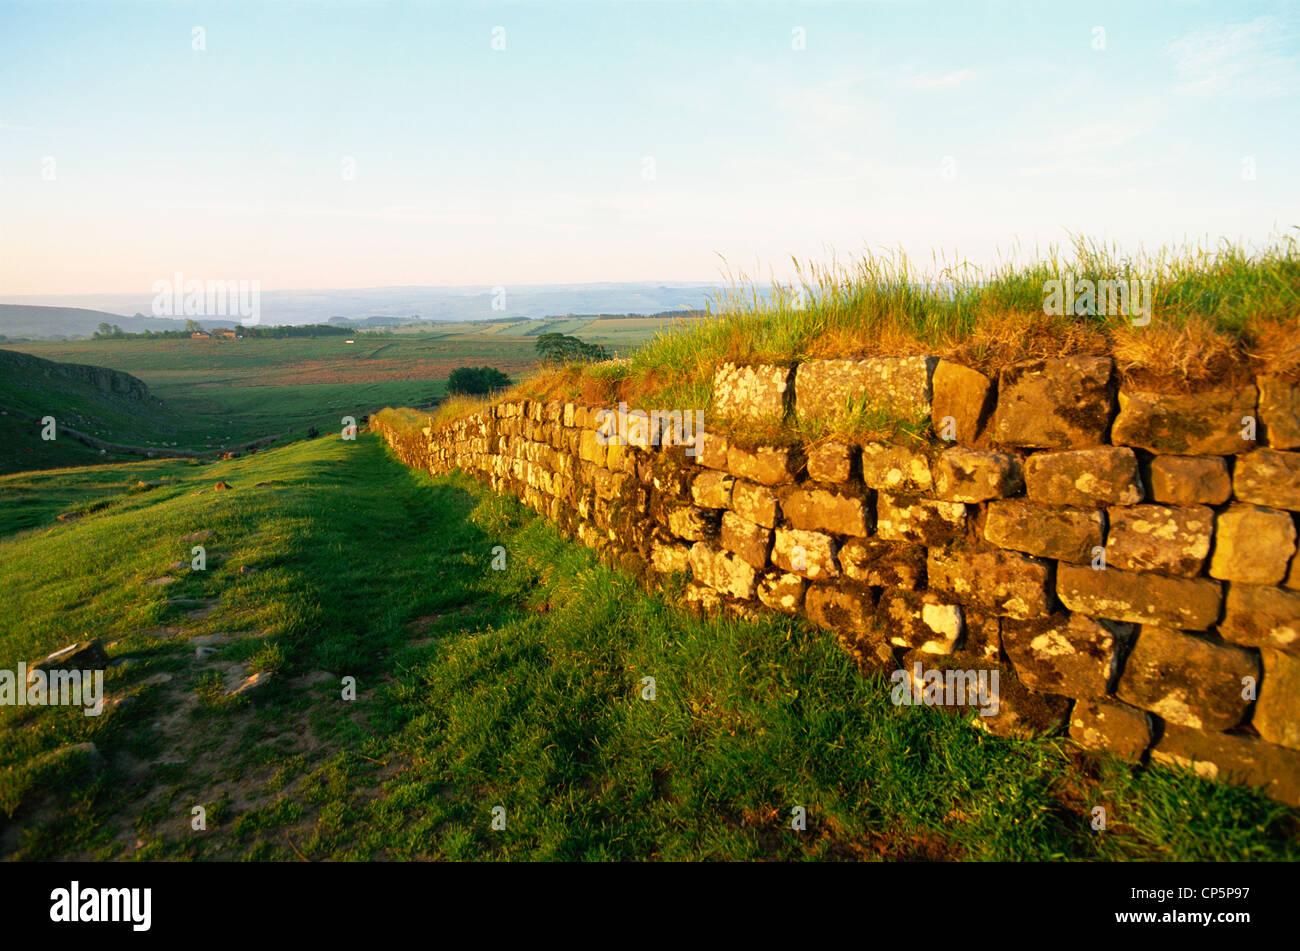 England, Northumbria, Hadrian's Wall, Views near Housesteads Roman Fort - Stock Image